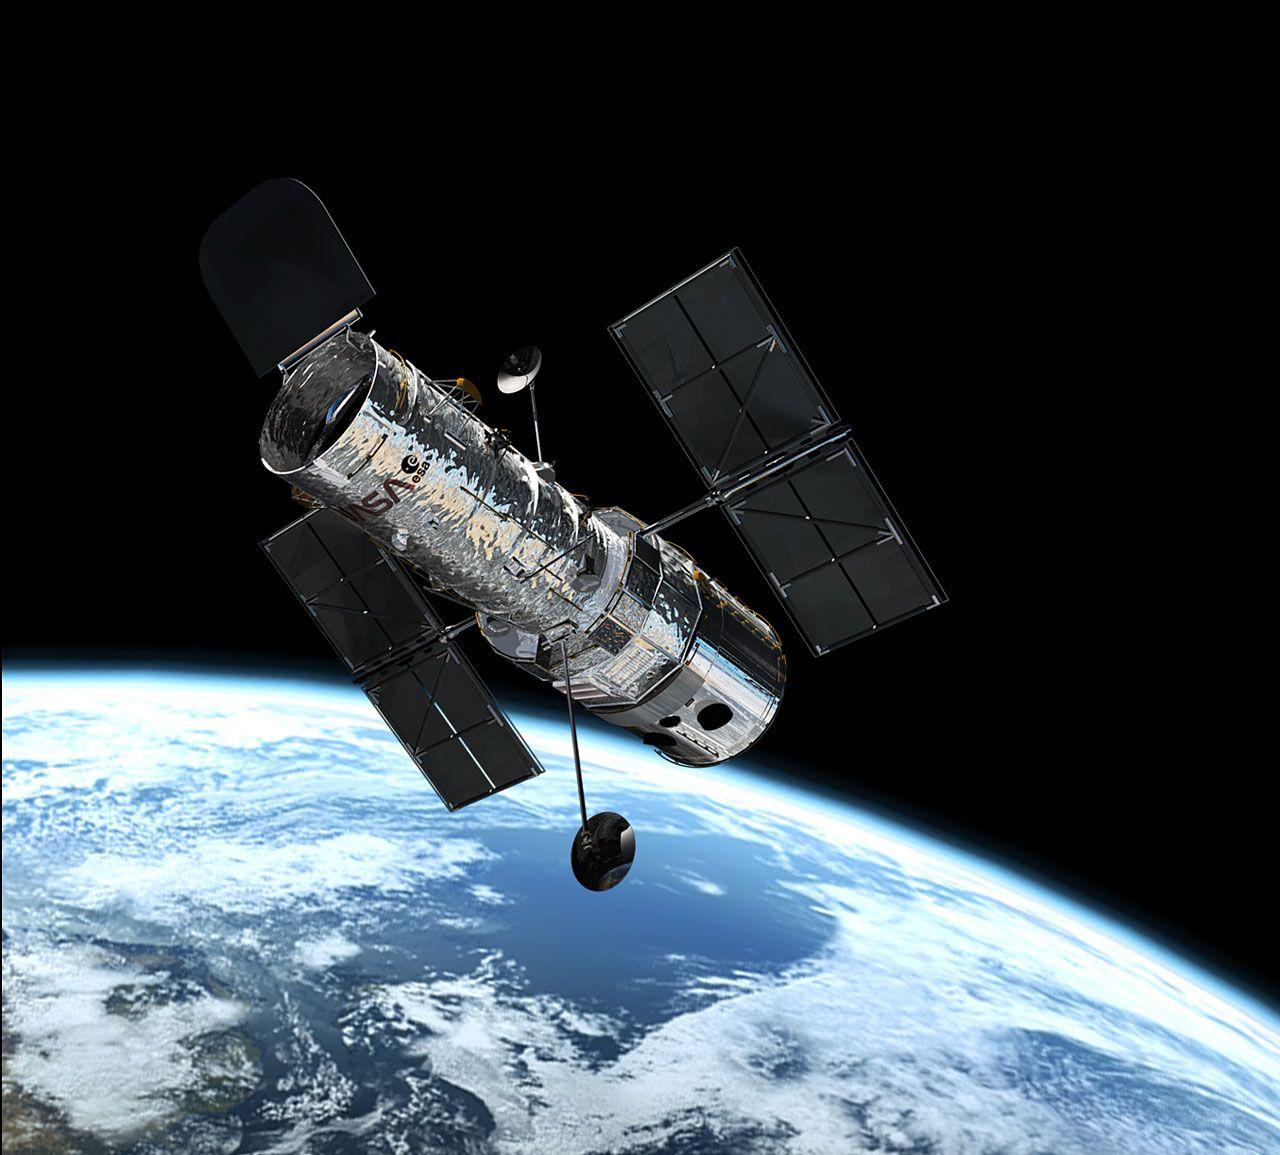 ТОП-10 открытий телескопа Hubble